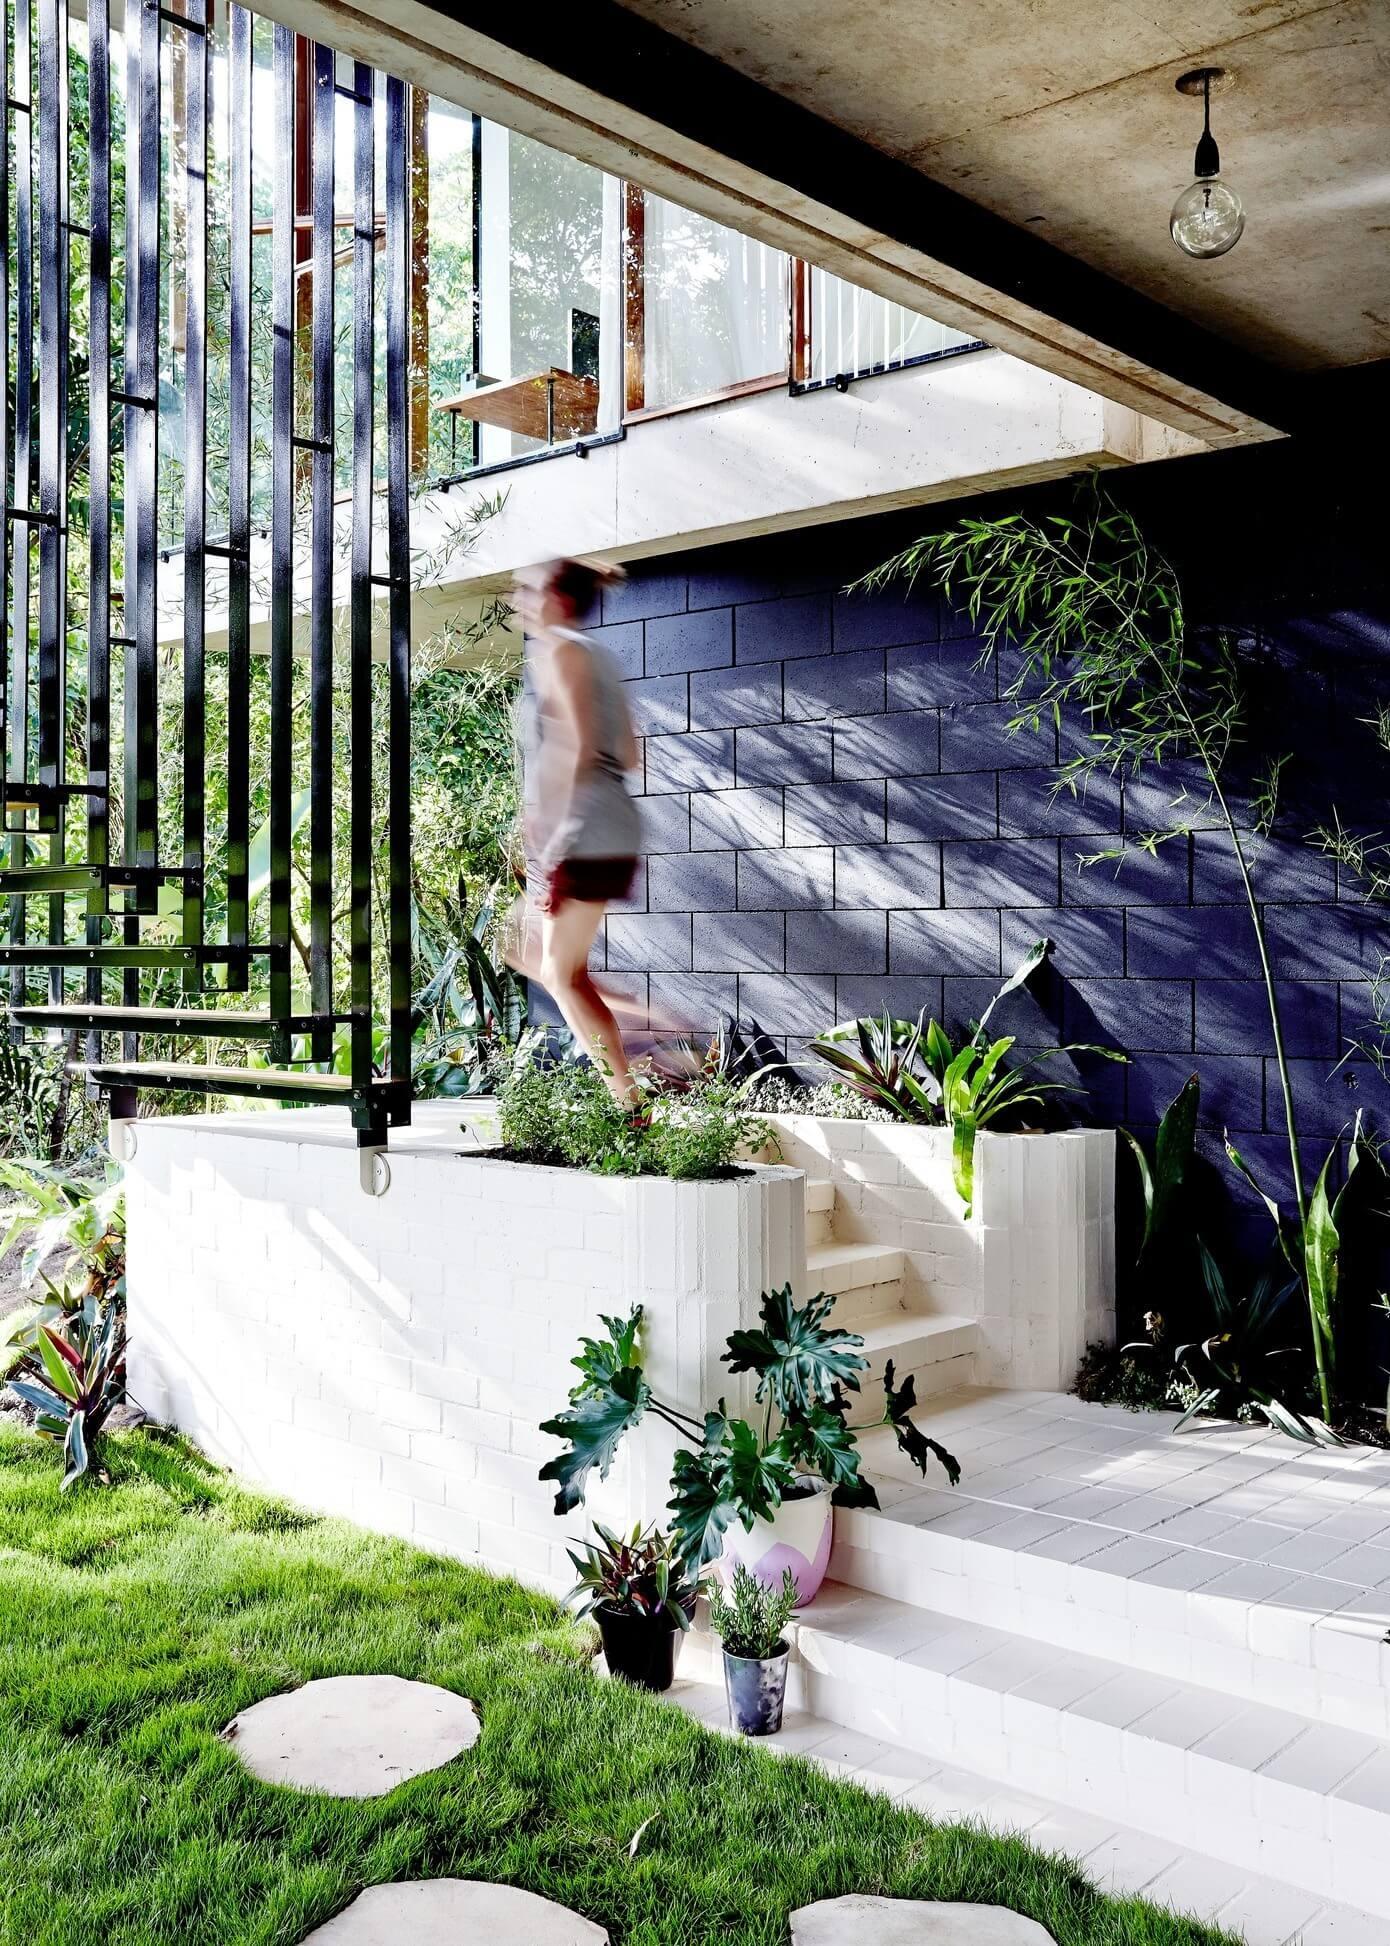 planchonella-house-jesse-bennett-architect-24